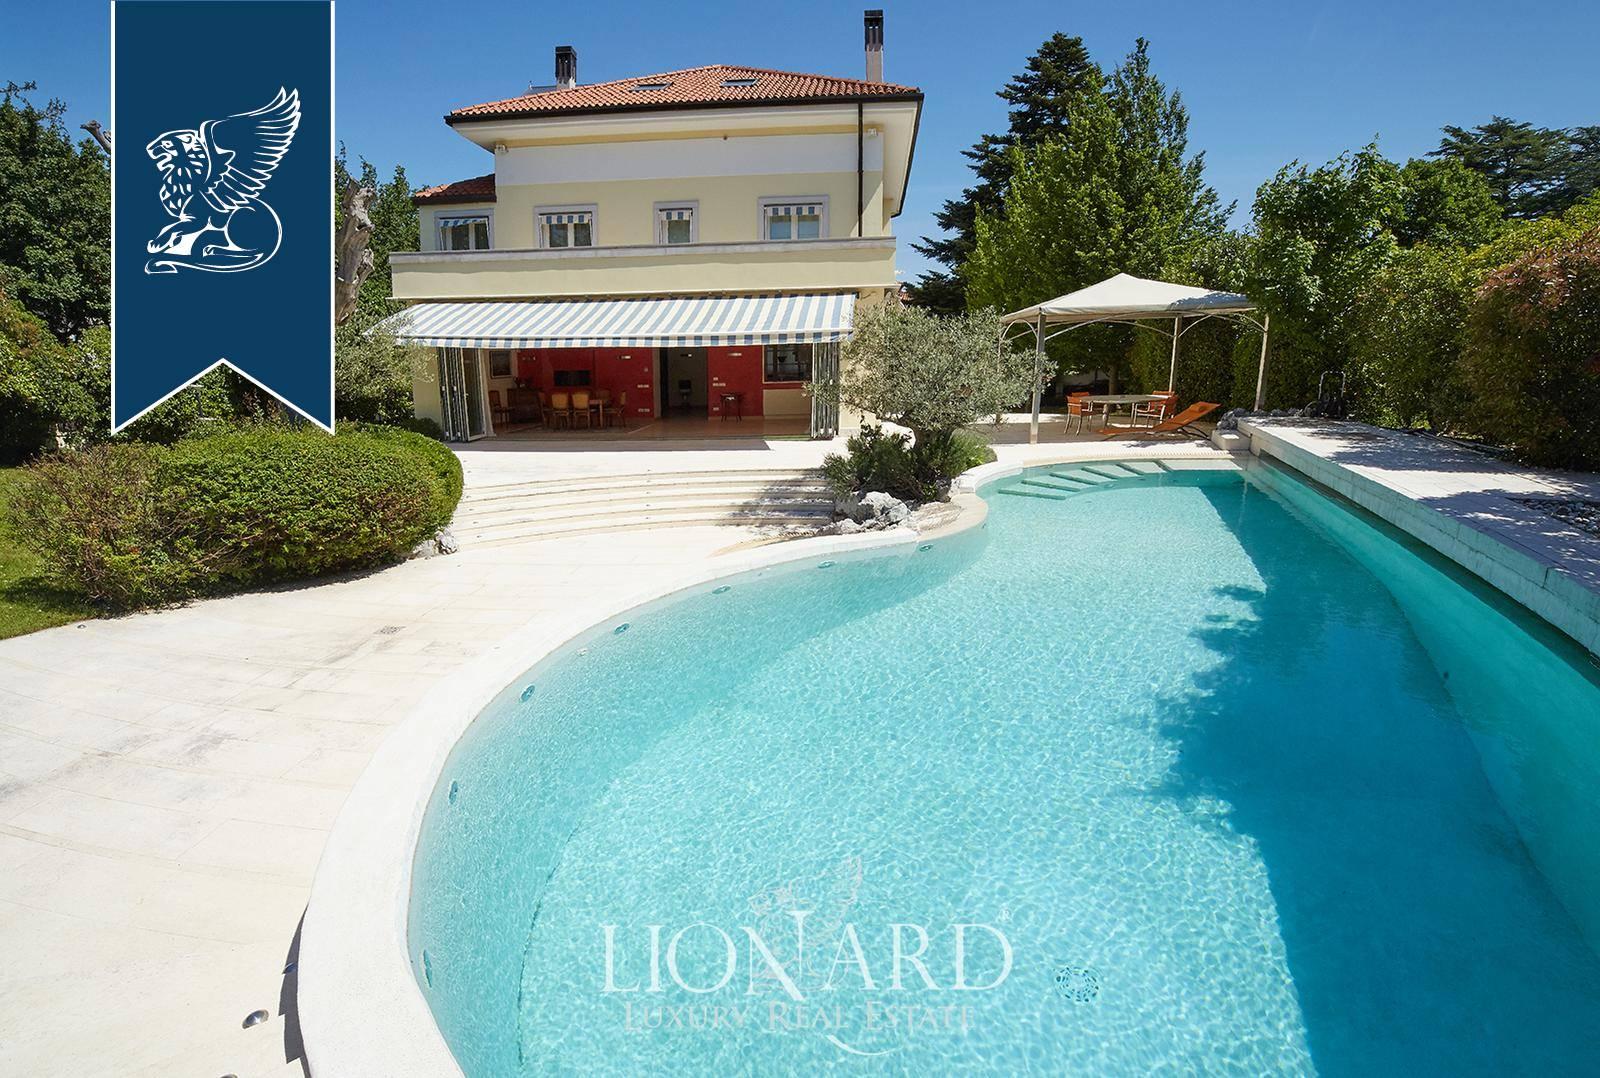 Villa in Vendita a Trieste: 0 locali, 500 mq - Foto 2